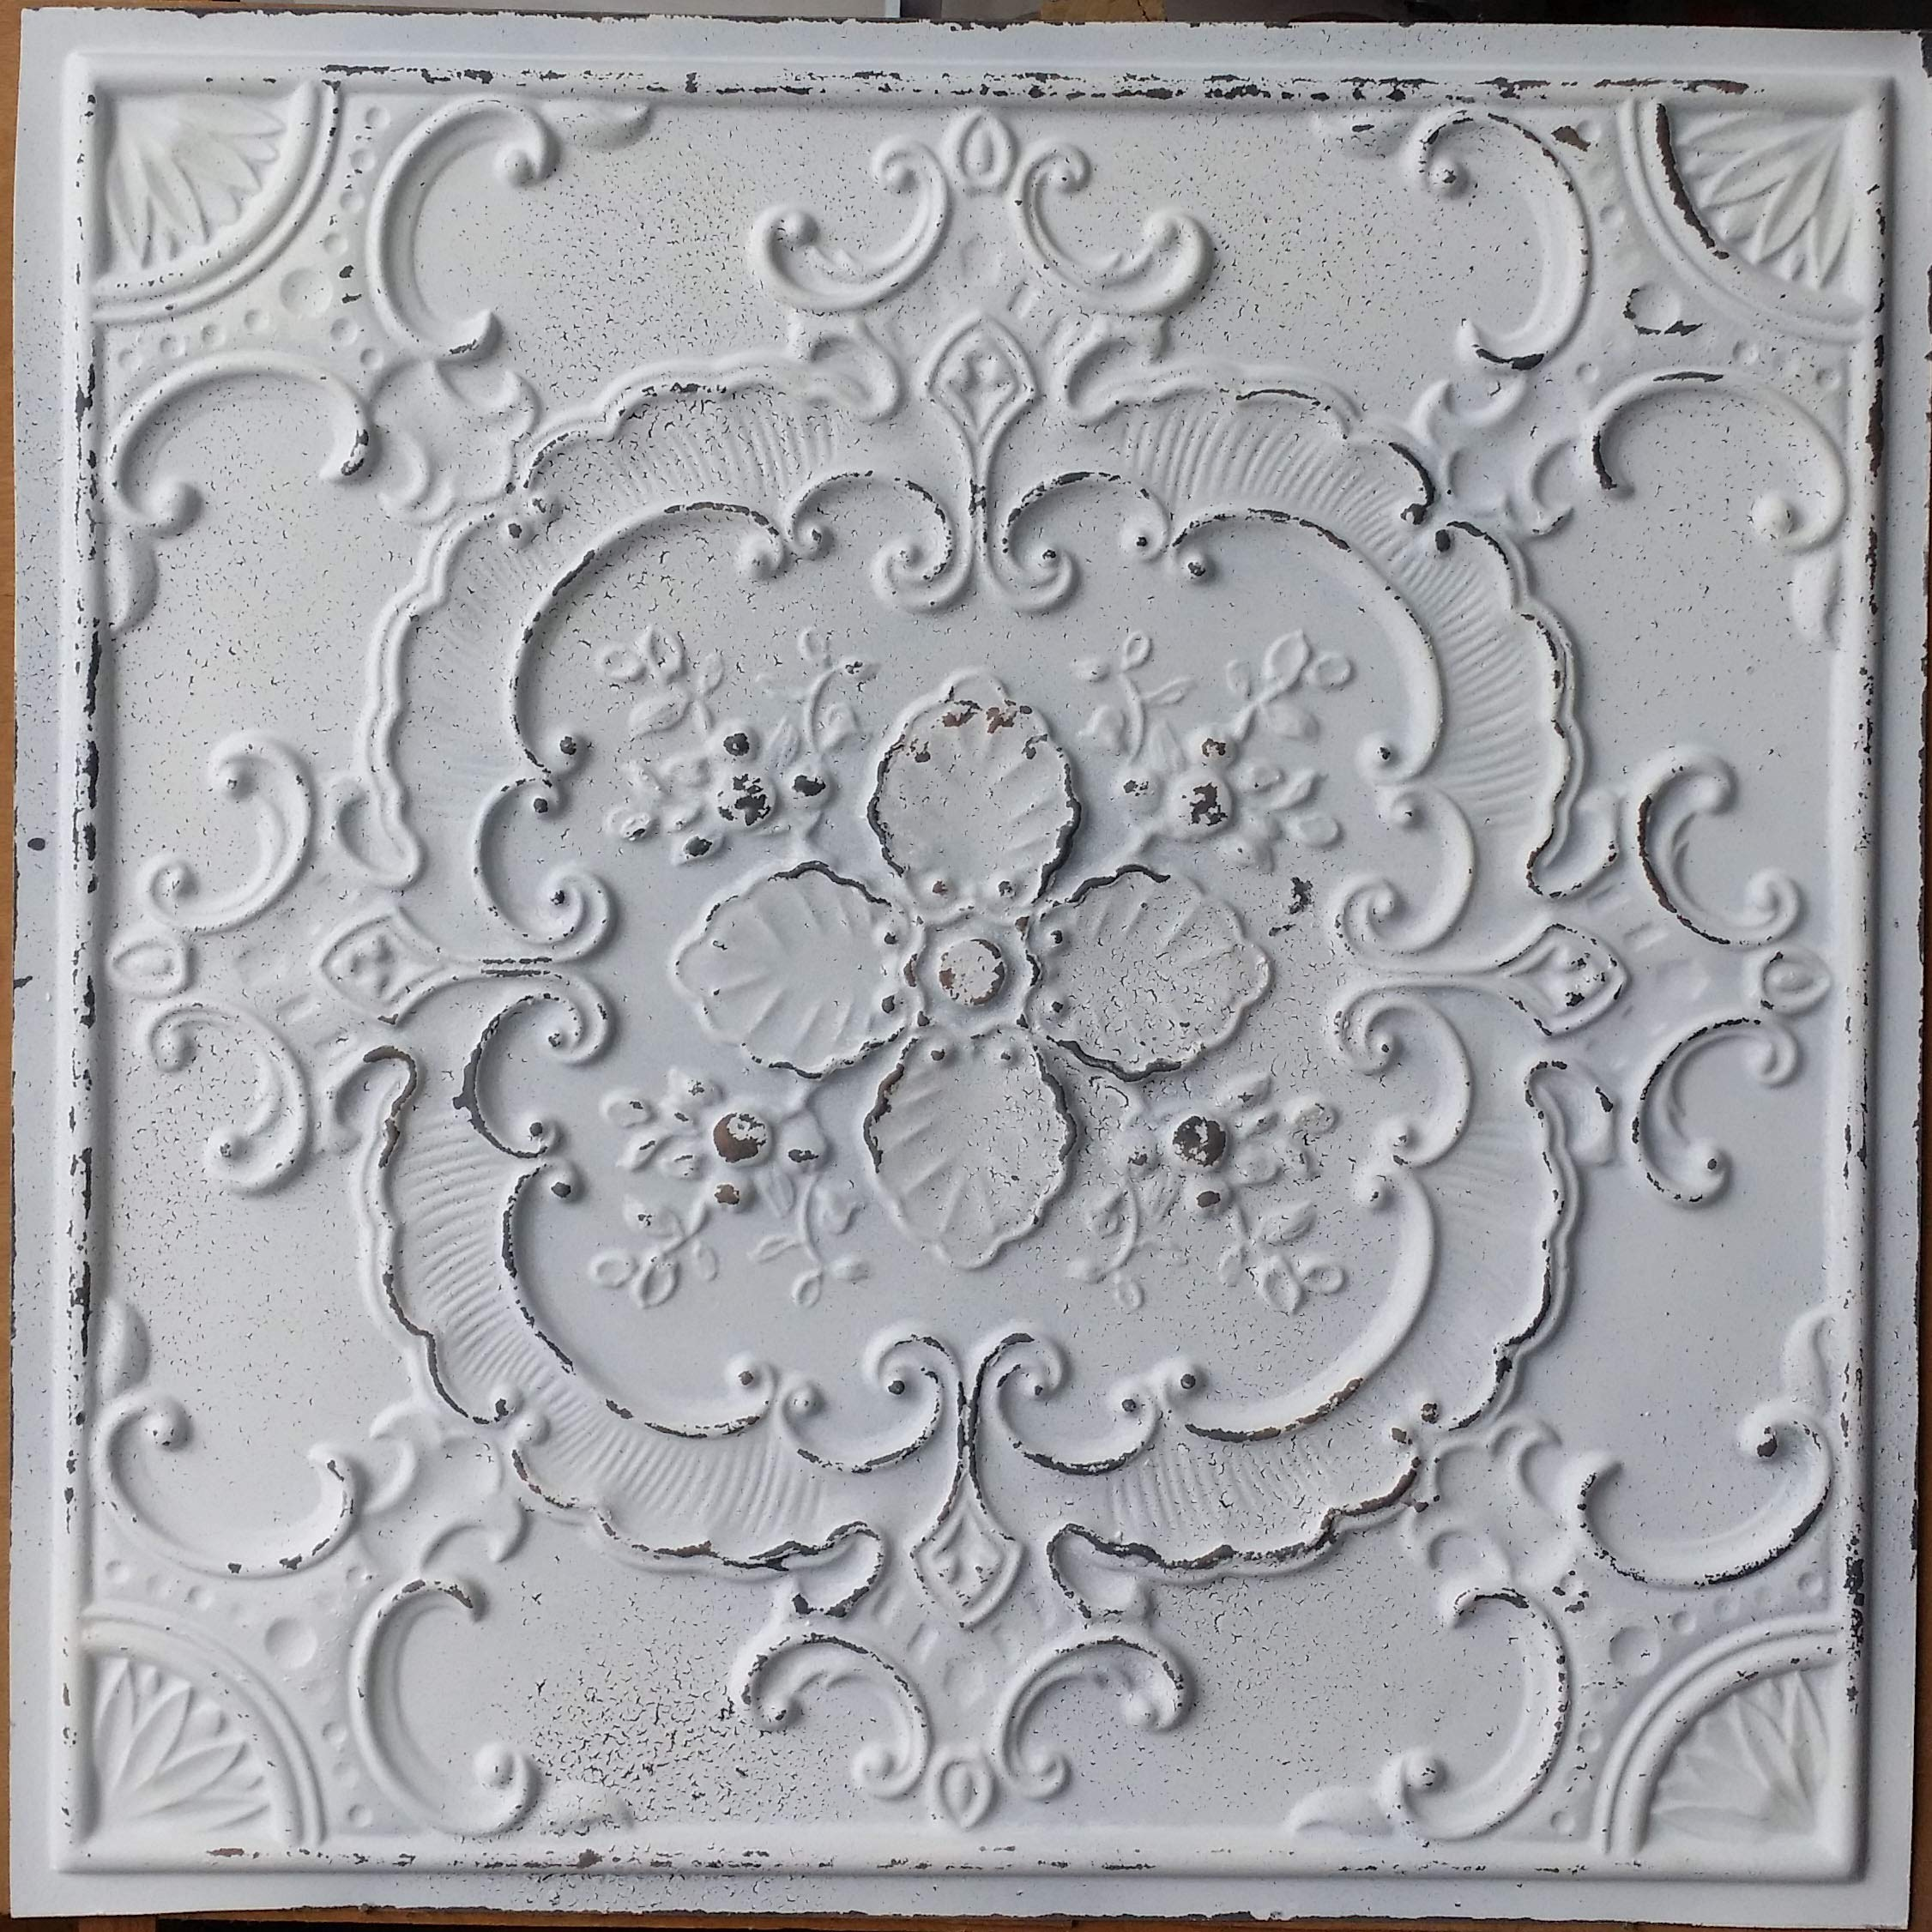 PLASTDECOR Ceiling Tile Faux tin Painted Peeling Black White Cafe Decor Ceiling Panels PL19 Pack of 10pcs by PLASTDECOR